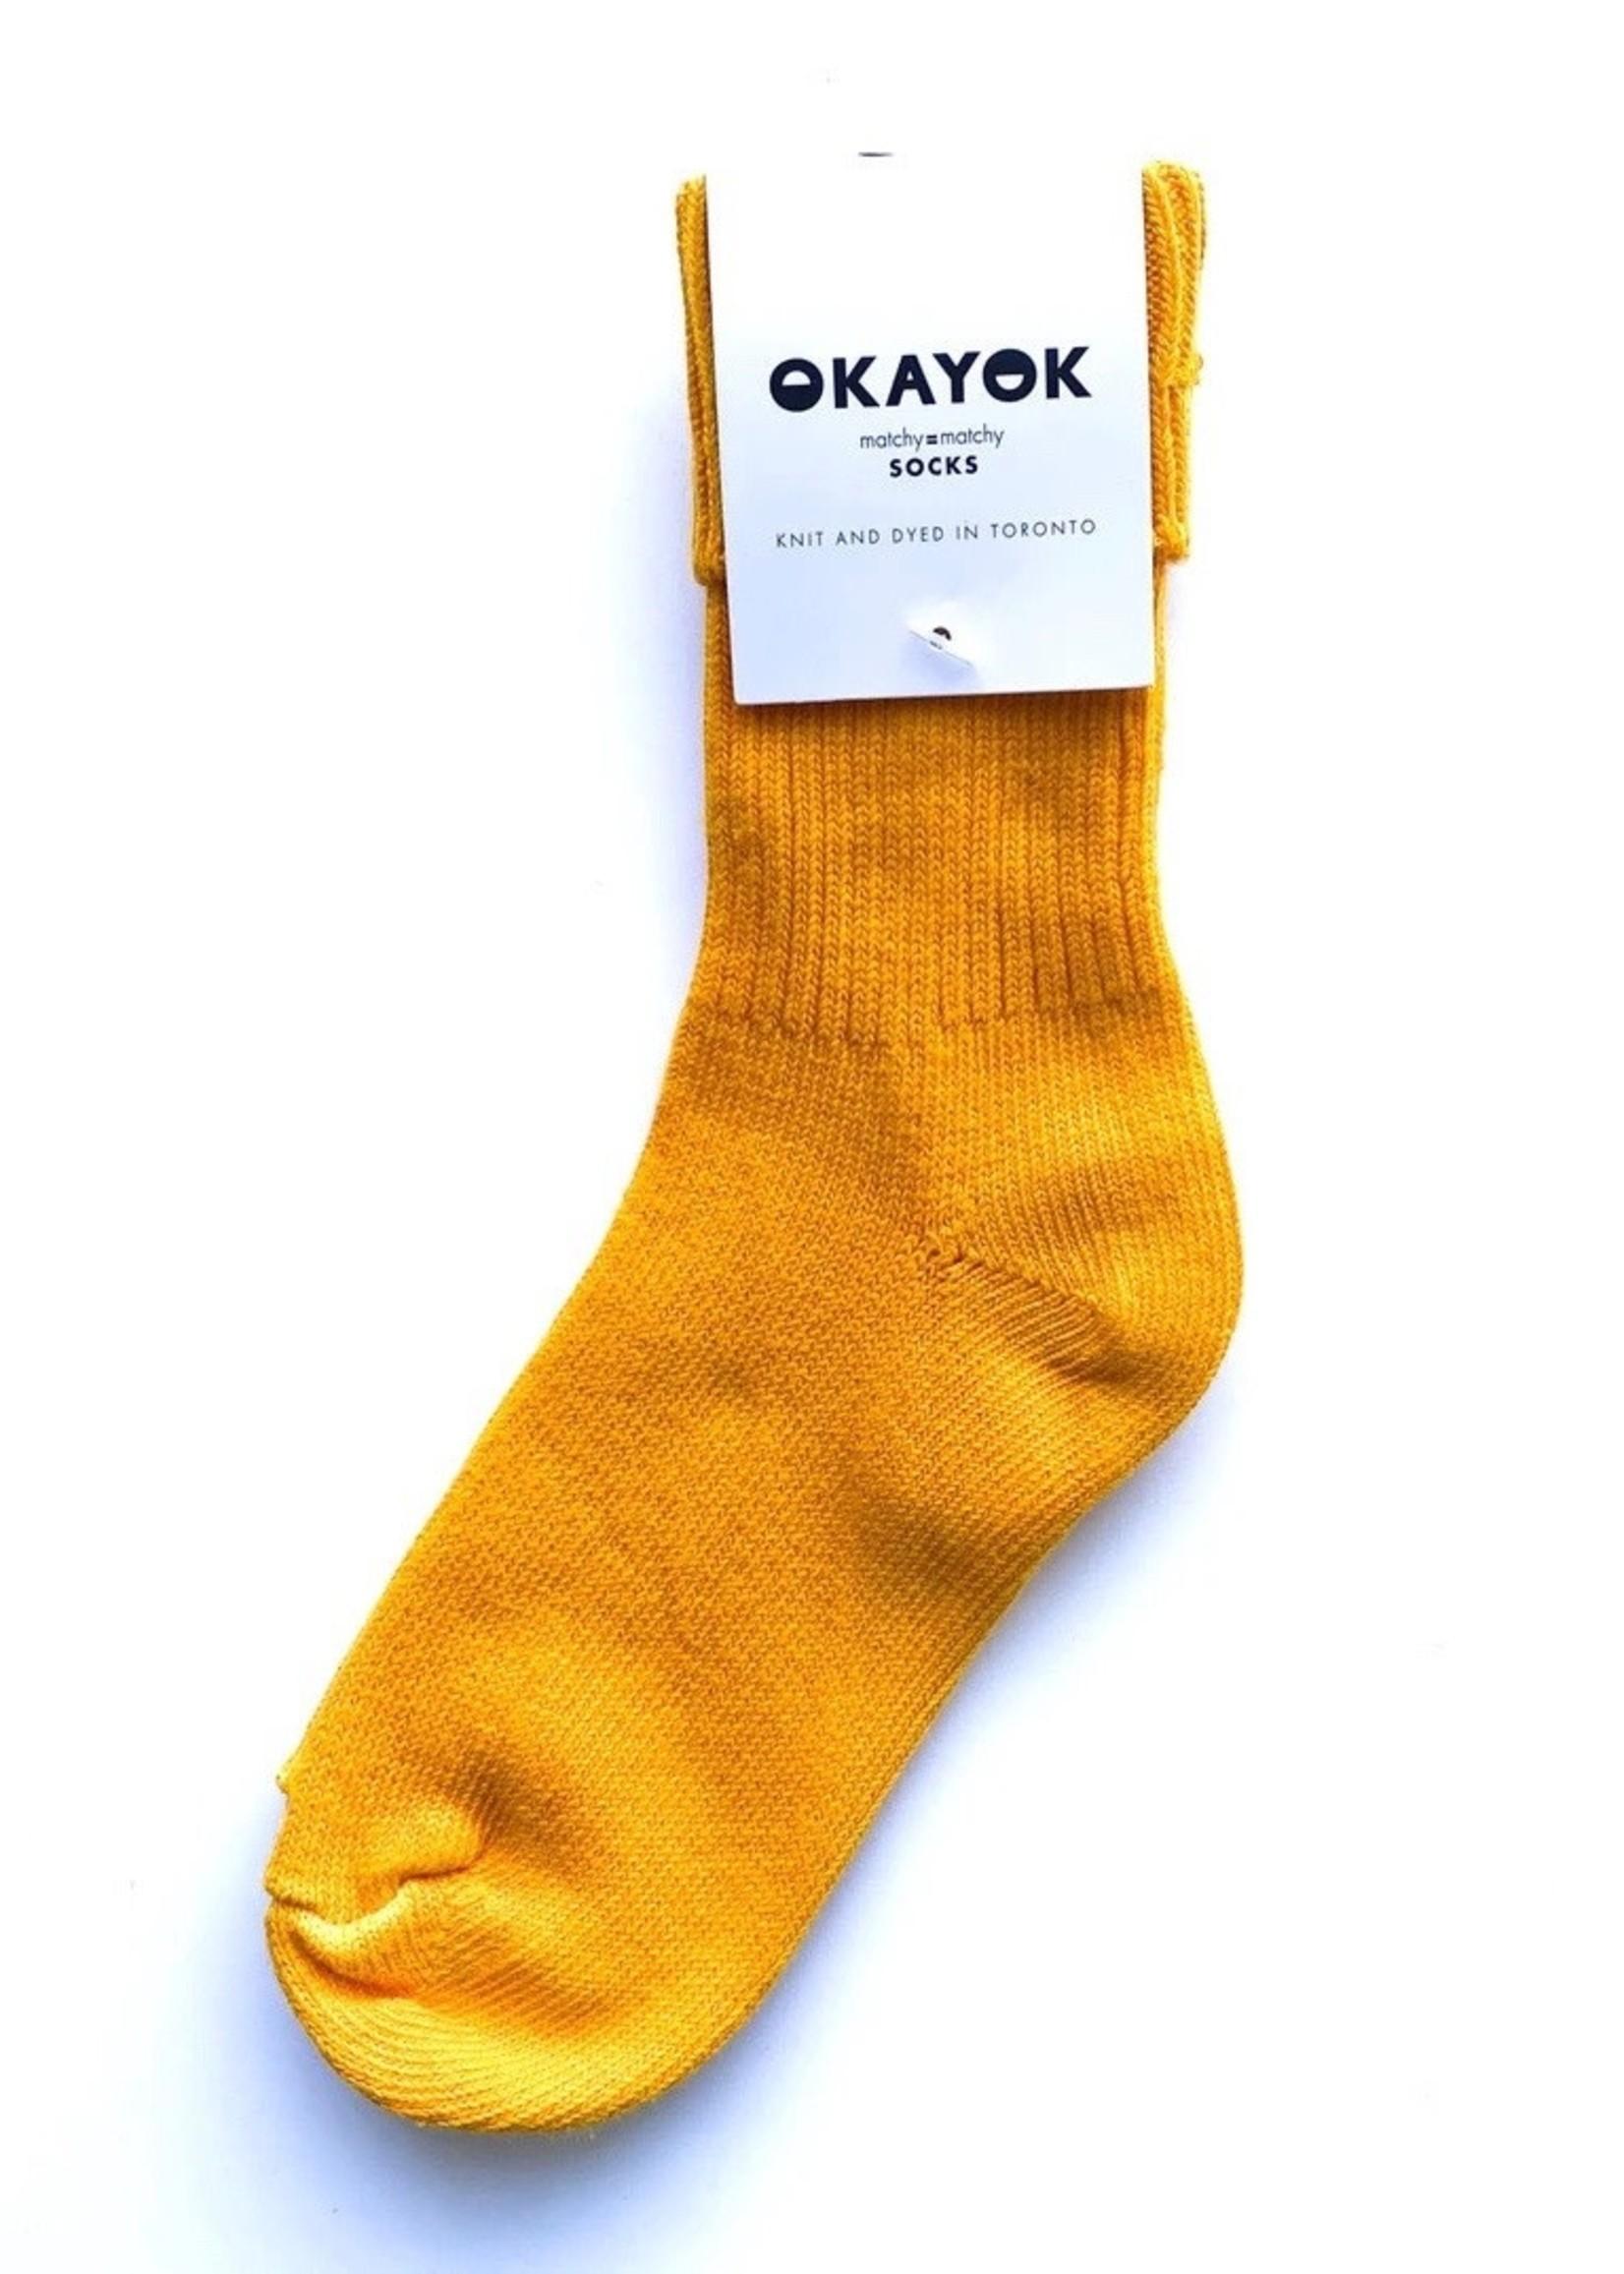 OKAYOK Cotton Socks OKAYOK